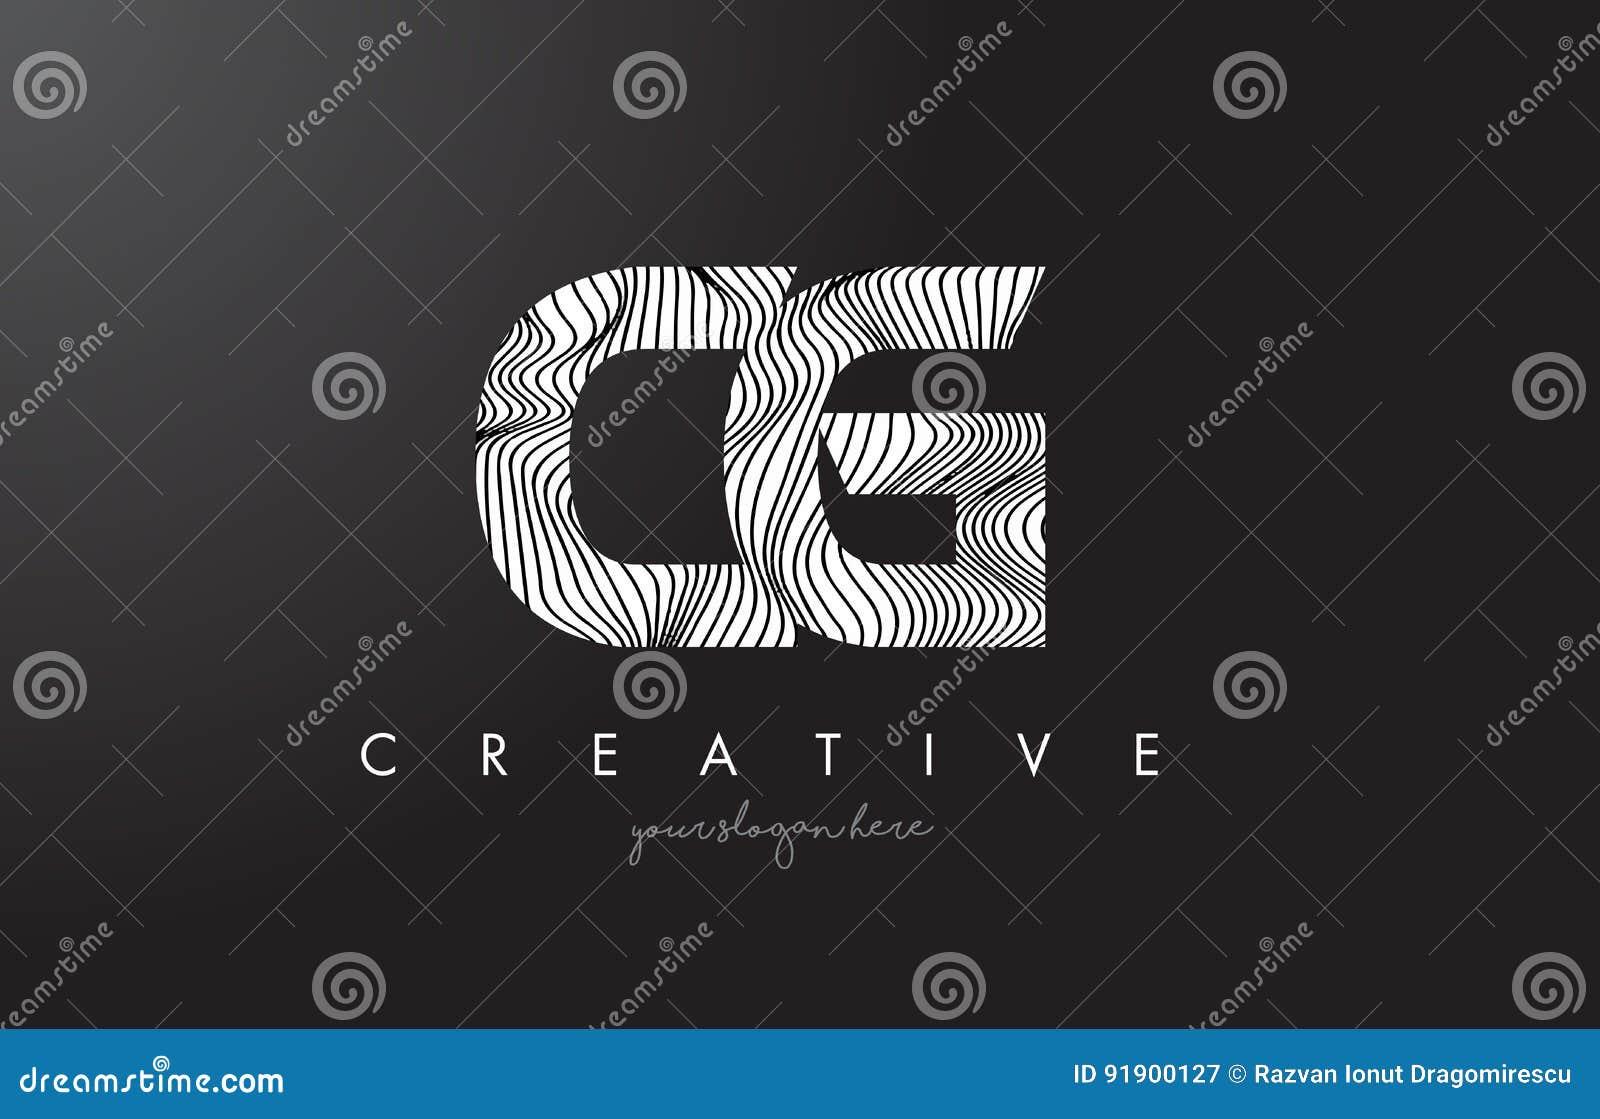 Cg C G Letter Logo With Zebra Lines Texture Design Vector